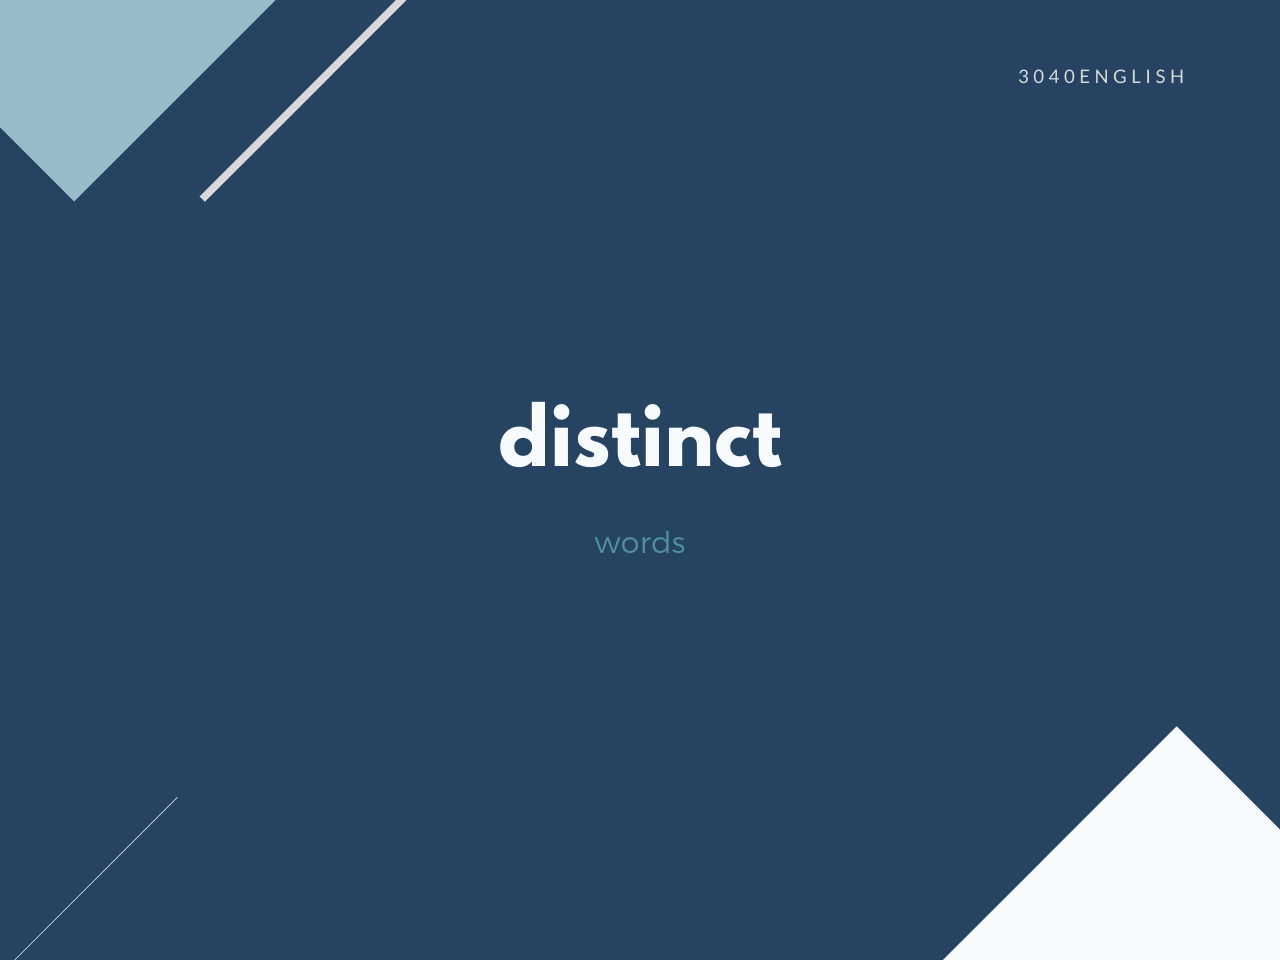 distinct の意味と簡単な使い方【音読用例文あり】